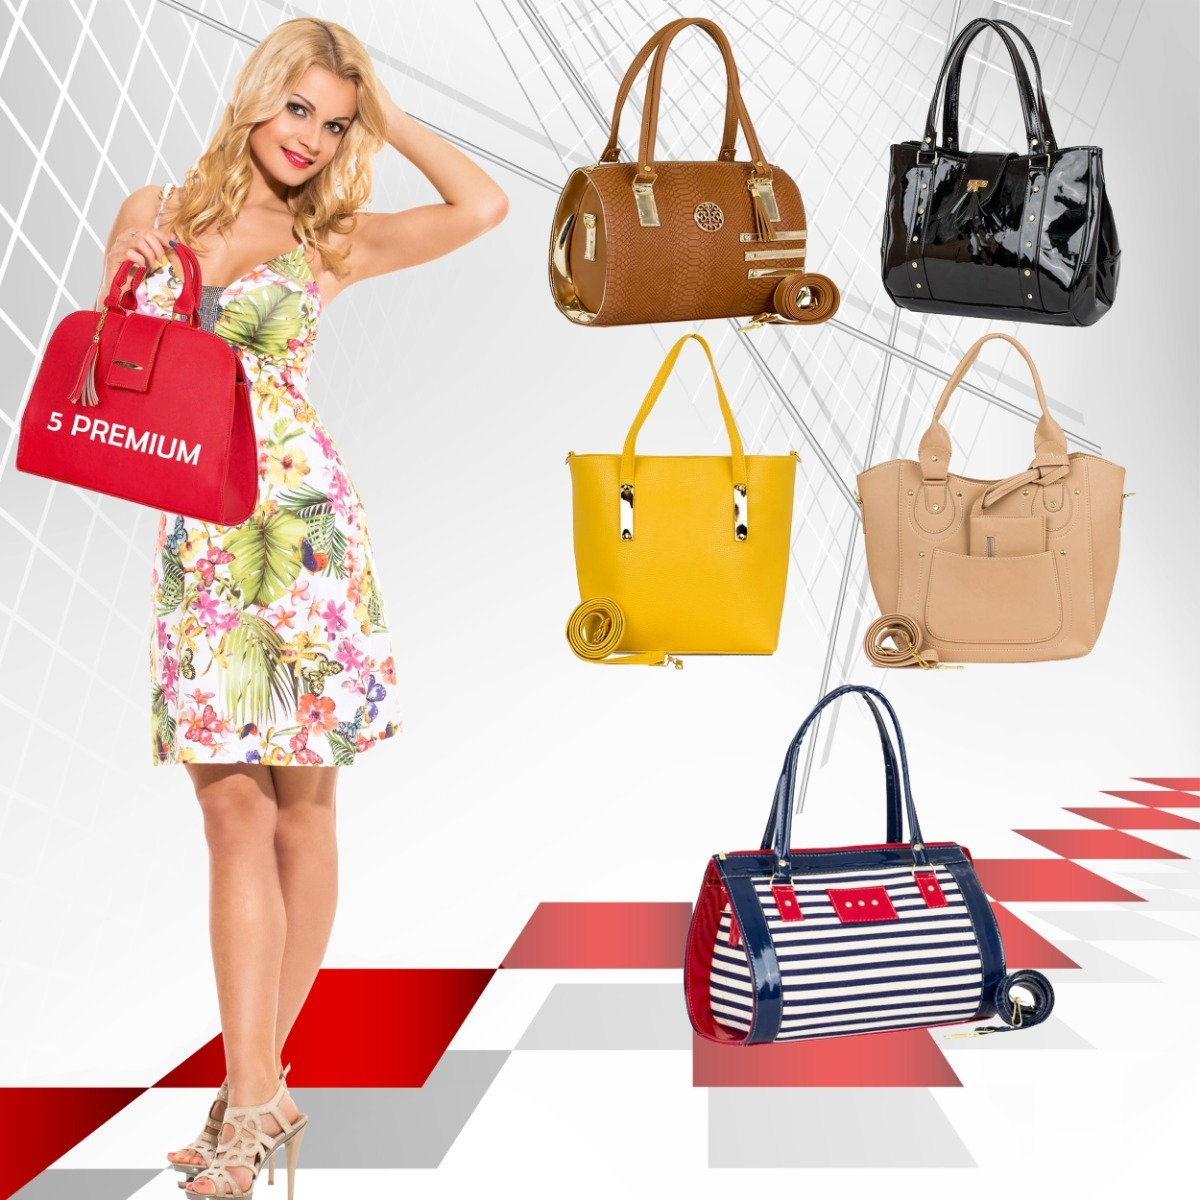 08ad3b51ed45a bolsas para dama mayoreo moda lote 5 bolsos mujer originales. Cargando zoom.